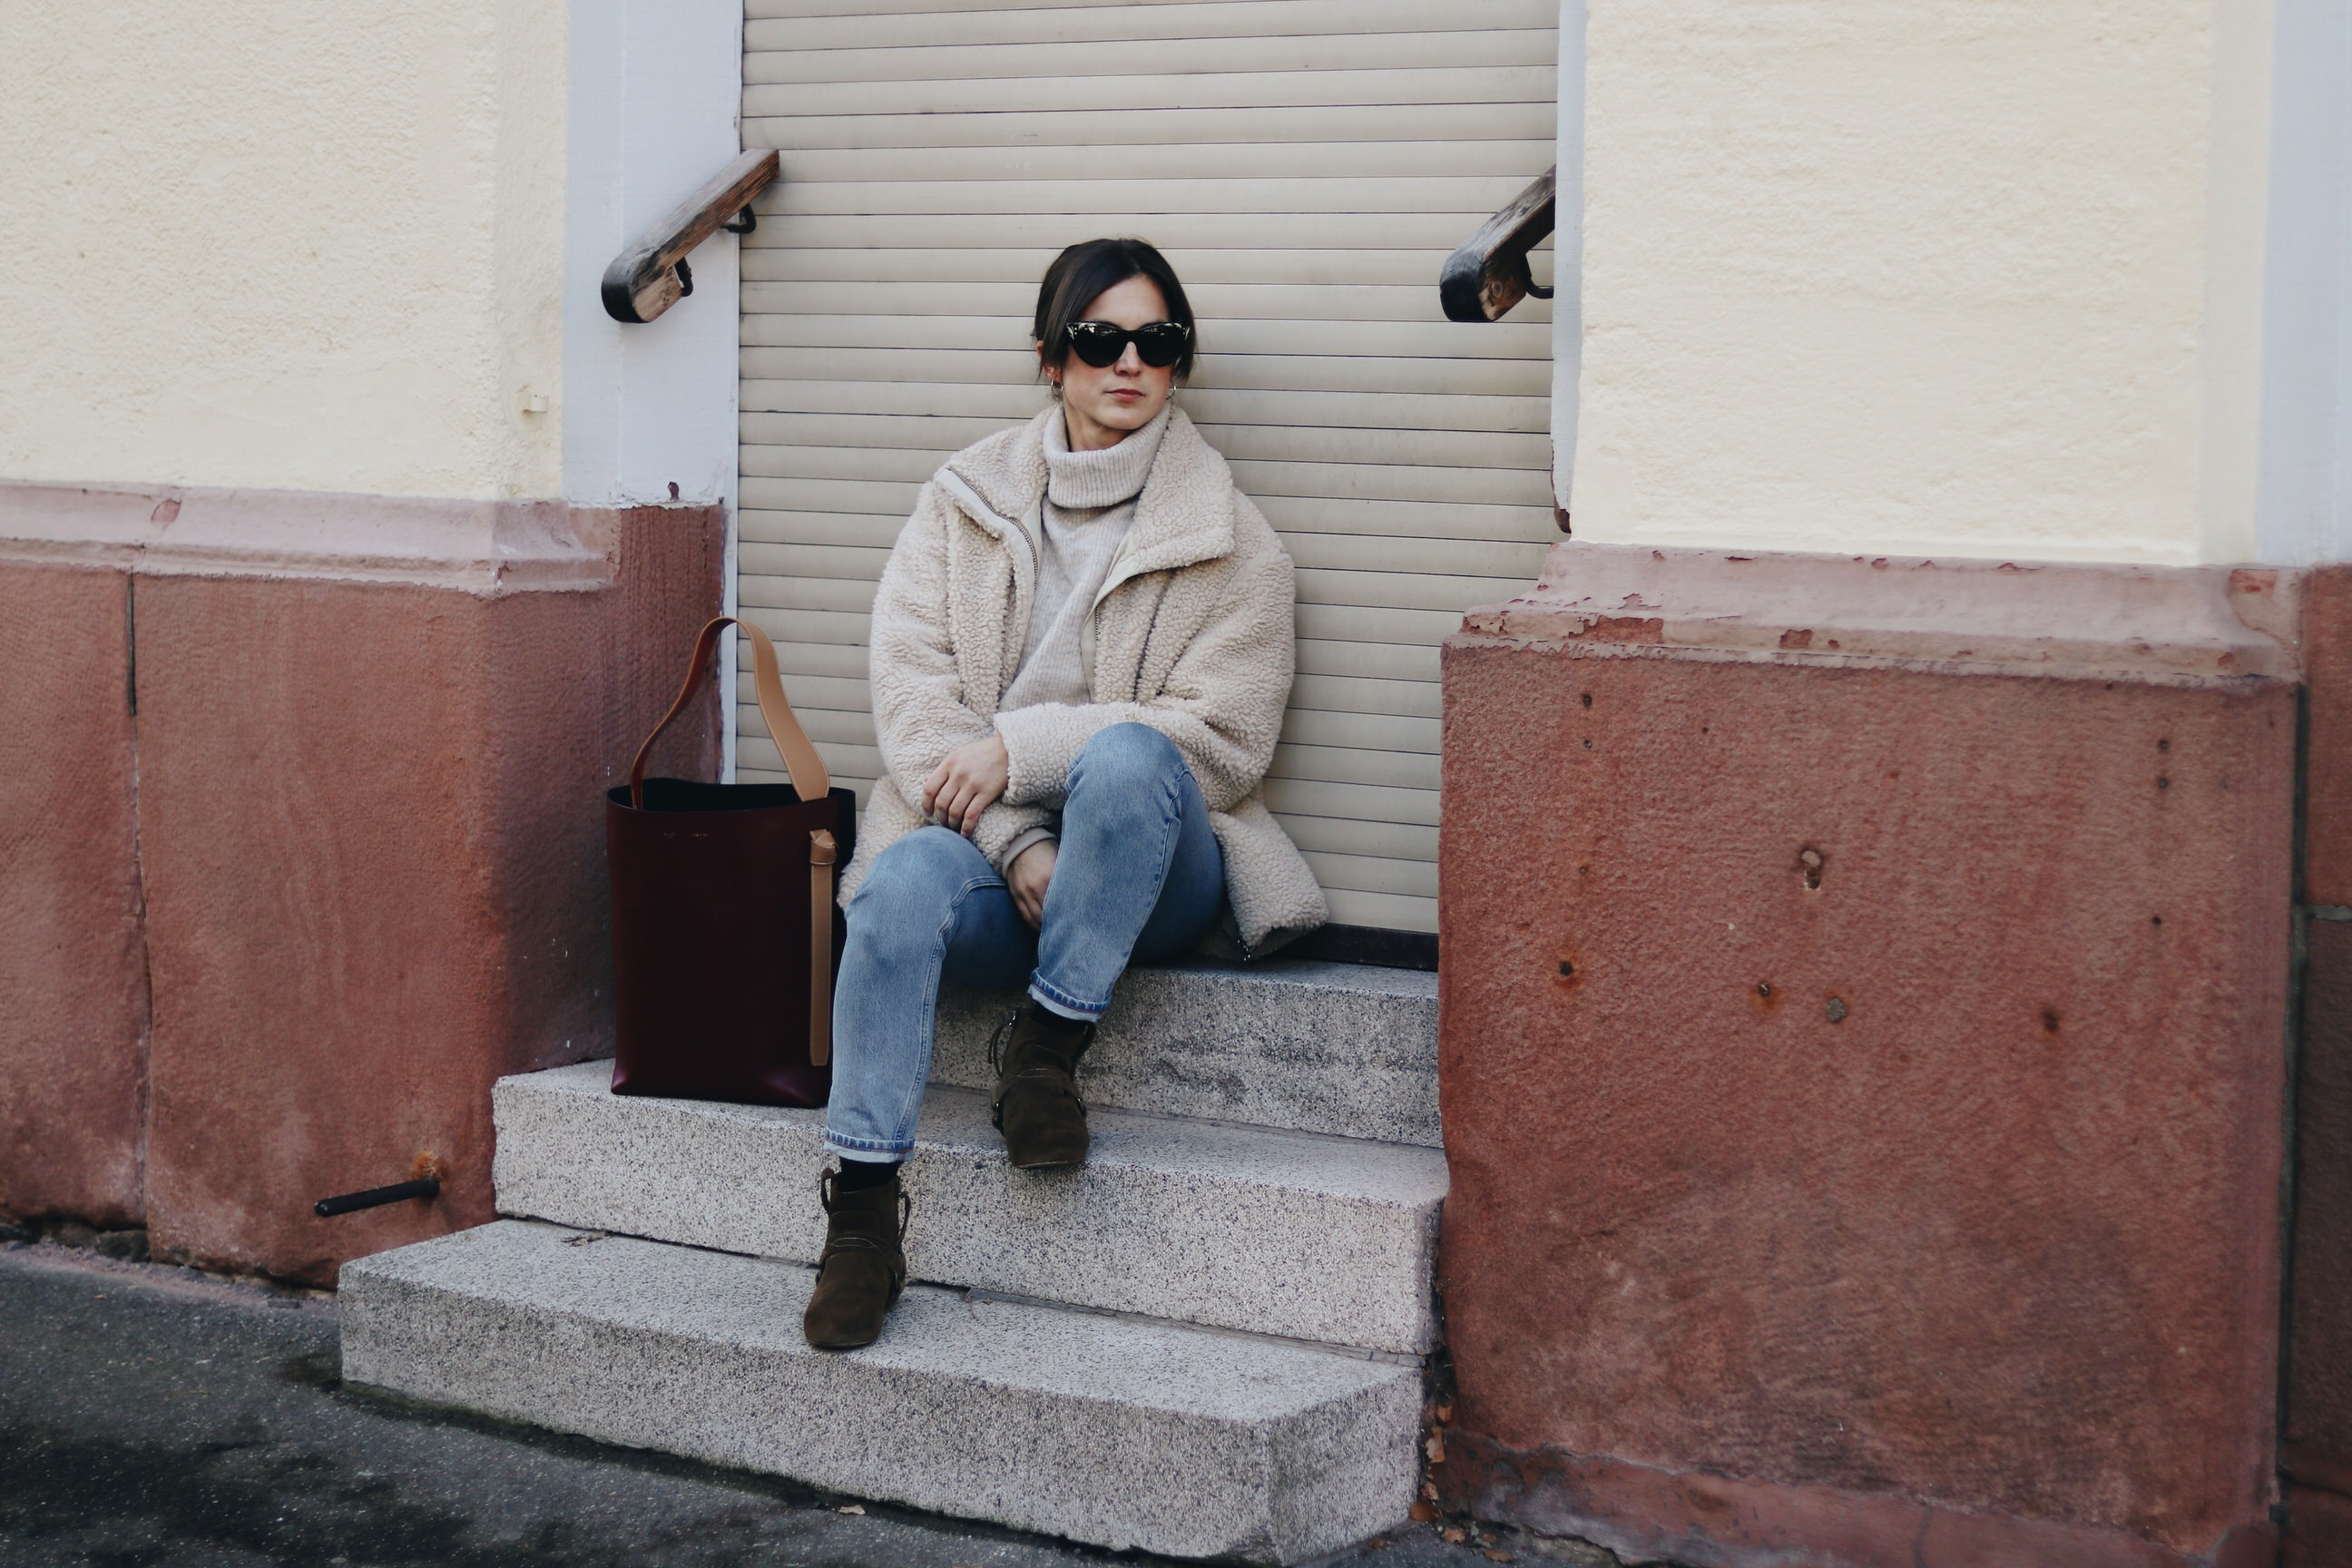 Modeblog Outfit Winter Teddyjacke Blog Modebloggerin Neele Gucci Sonnenbrille Celine Tasche Isabel Marant Booties Schuhe Fashionblog